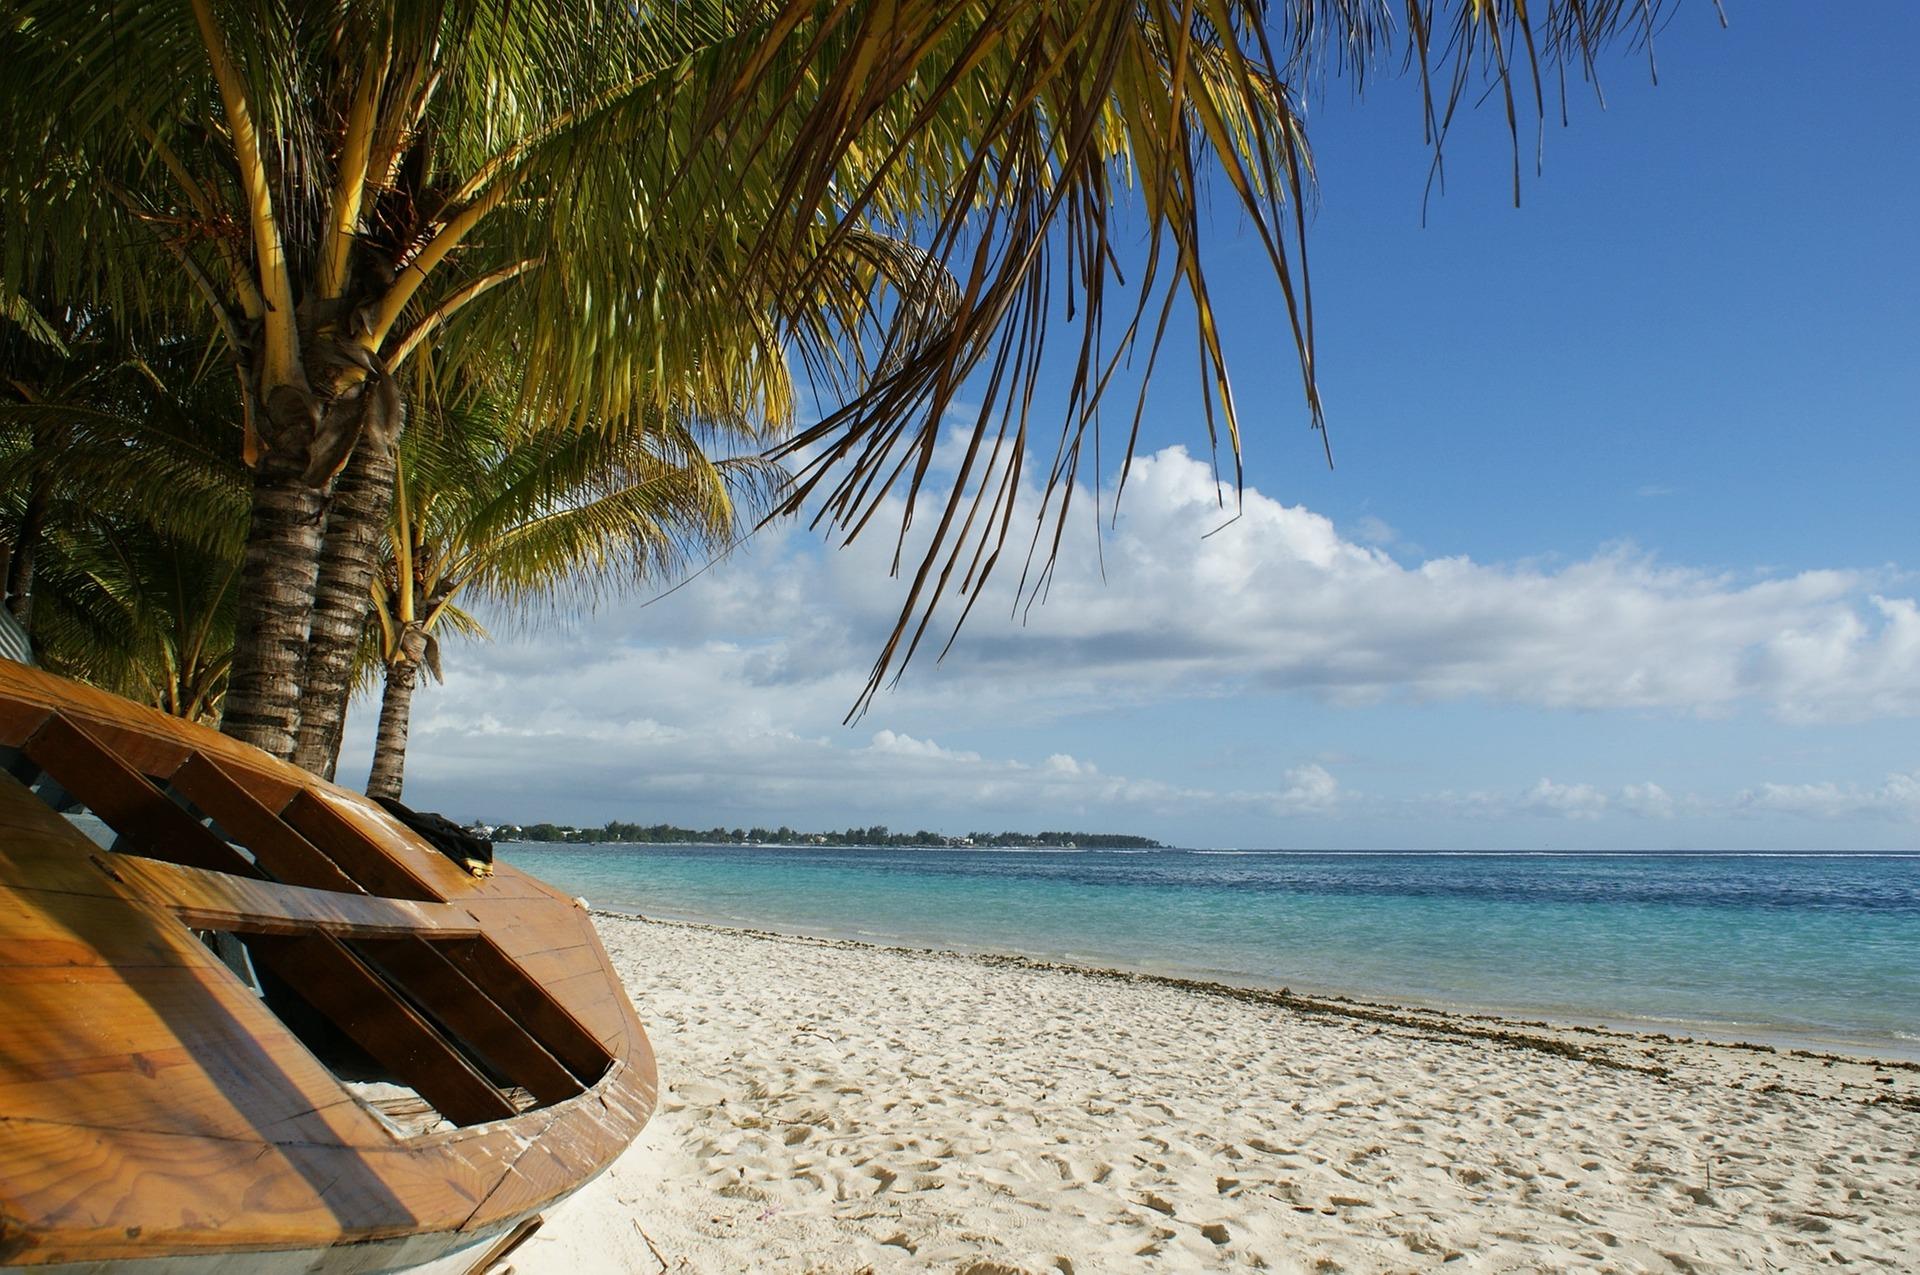 Mauritius All Inclusive Urlaub günstig ab 1169,00€ - 9 Tage